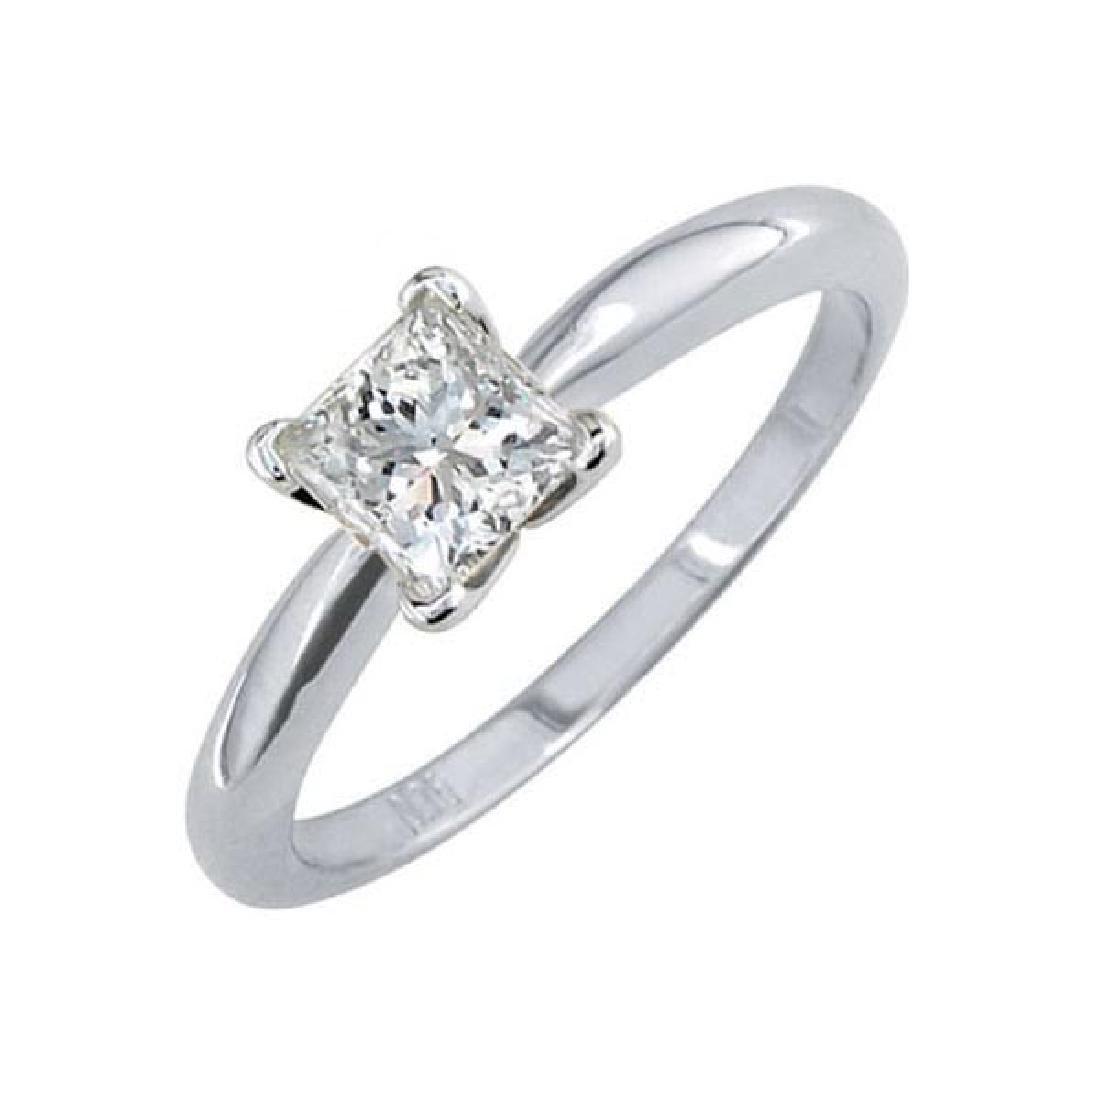 Certified 0.71 CTW Princess Diamond Solitaire 14k Ring